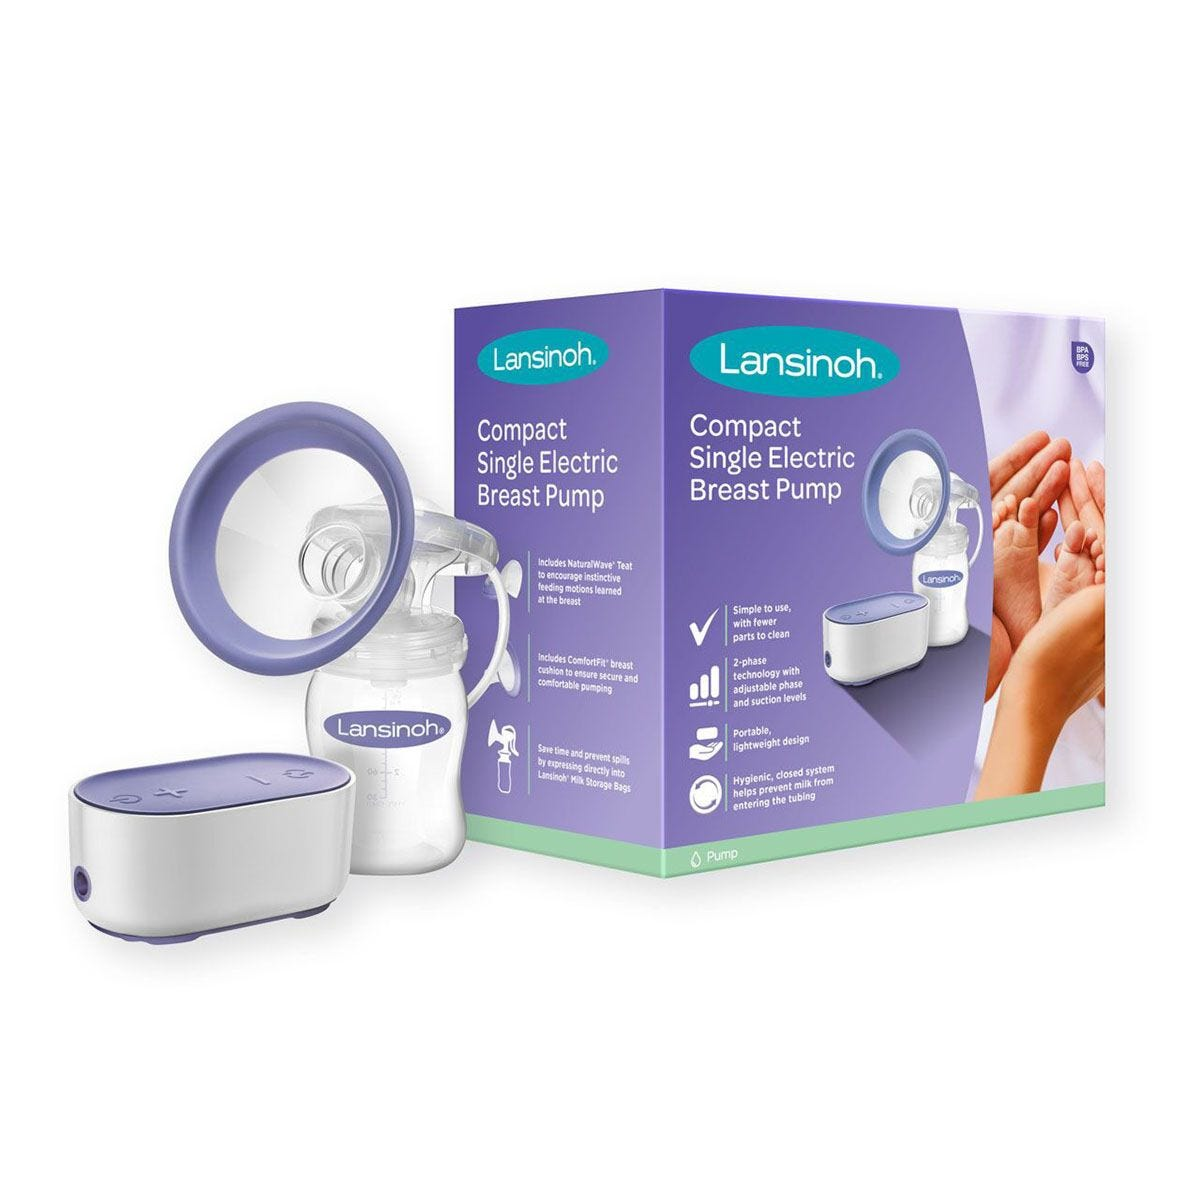 Lansinoh LN54091 Compact Electric Breast Pump – Purple & White